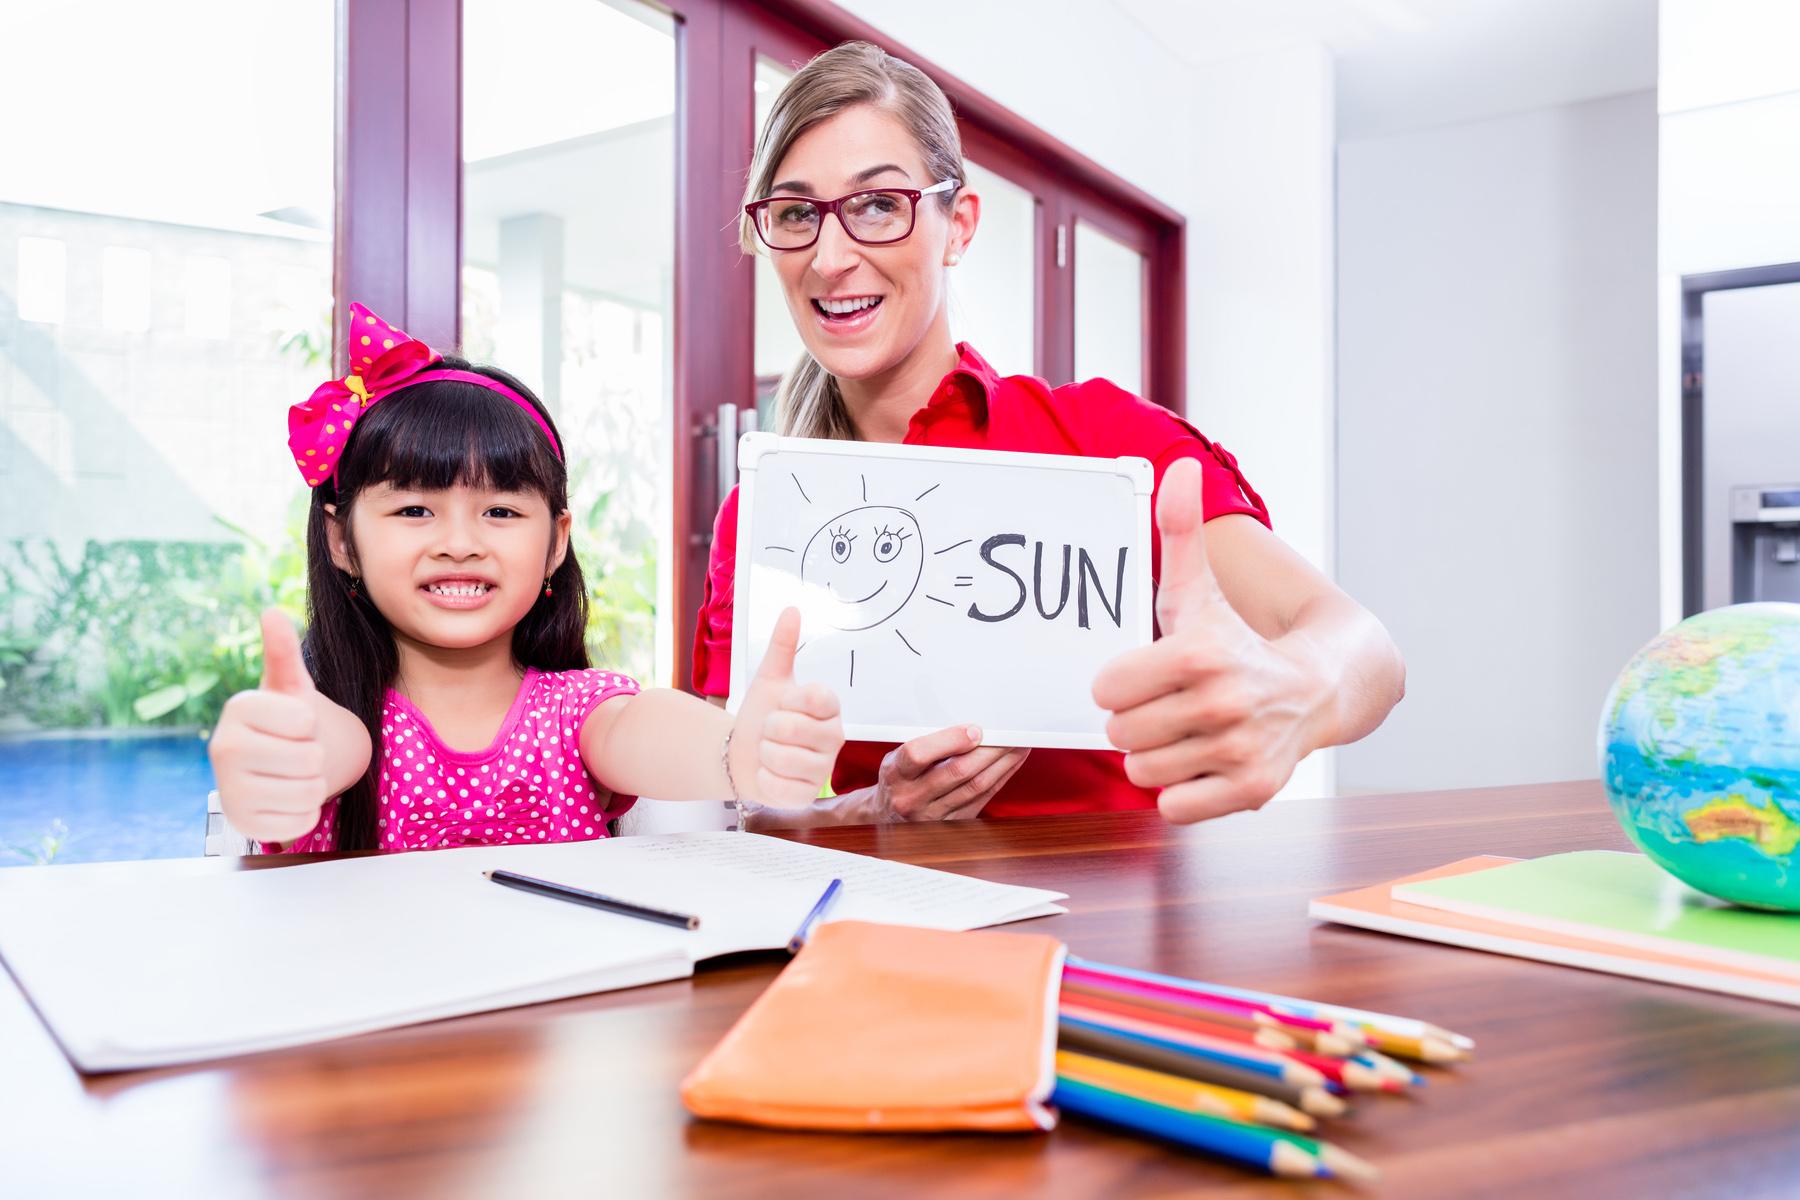 Language tutor with child